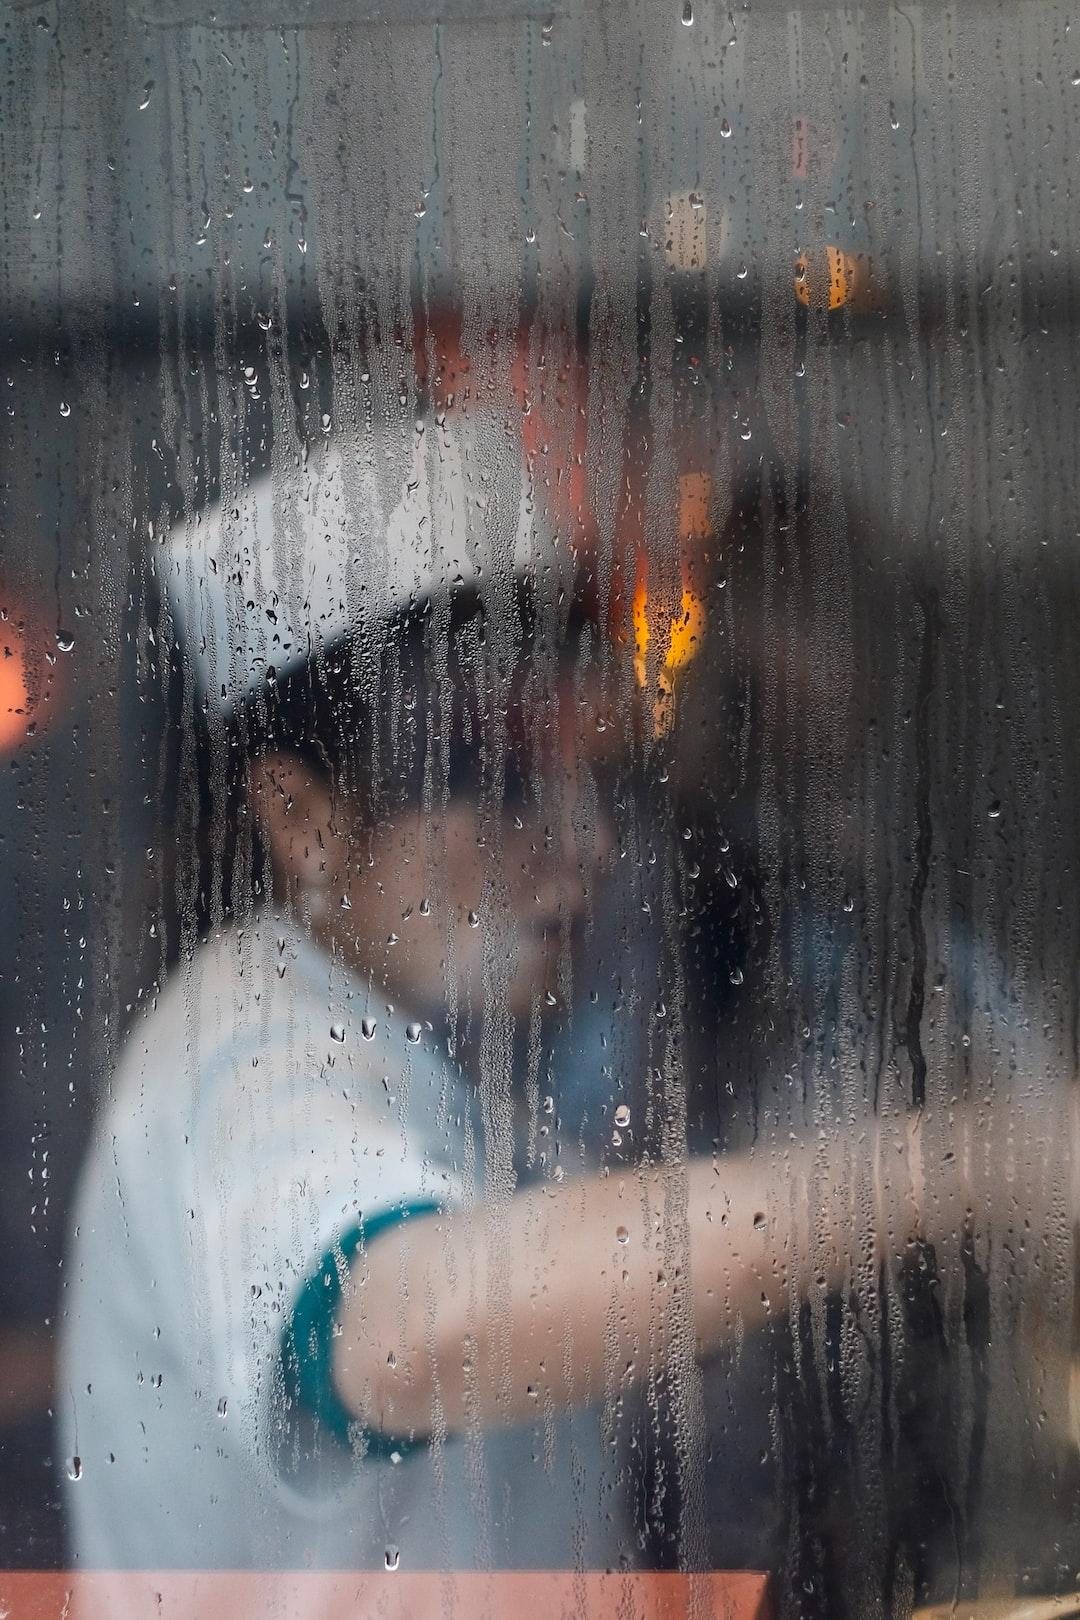 Cook behind a rainy window